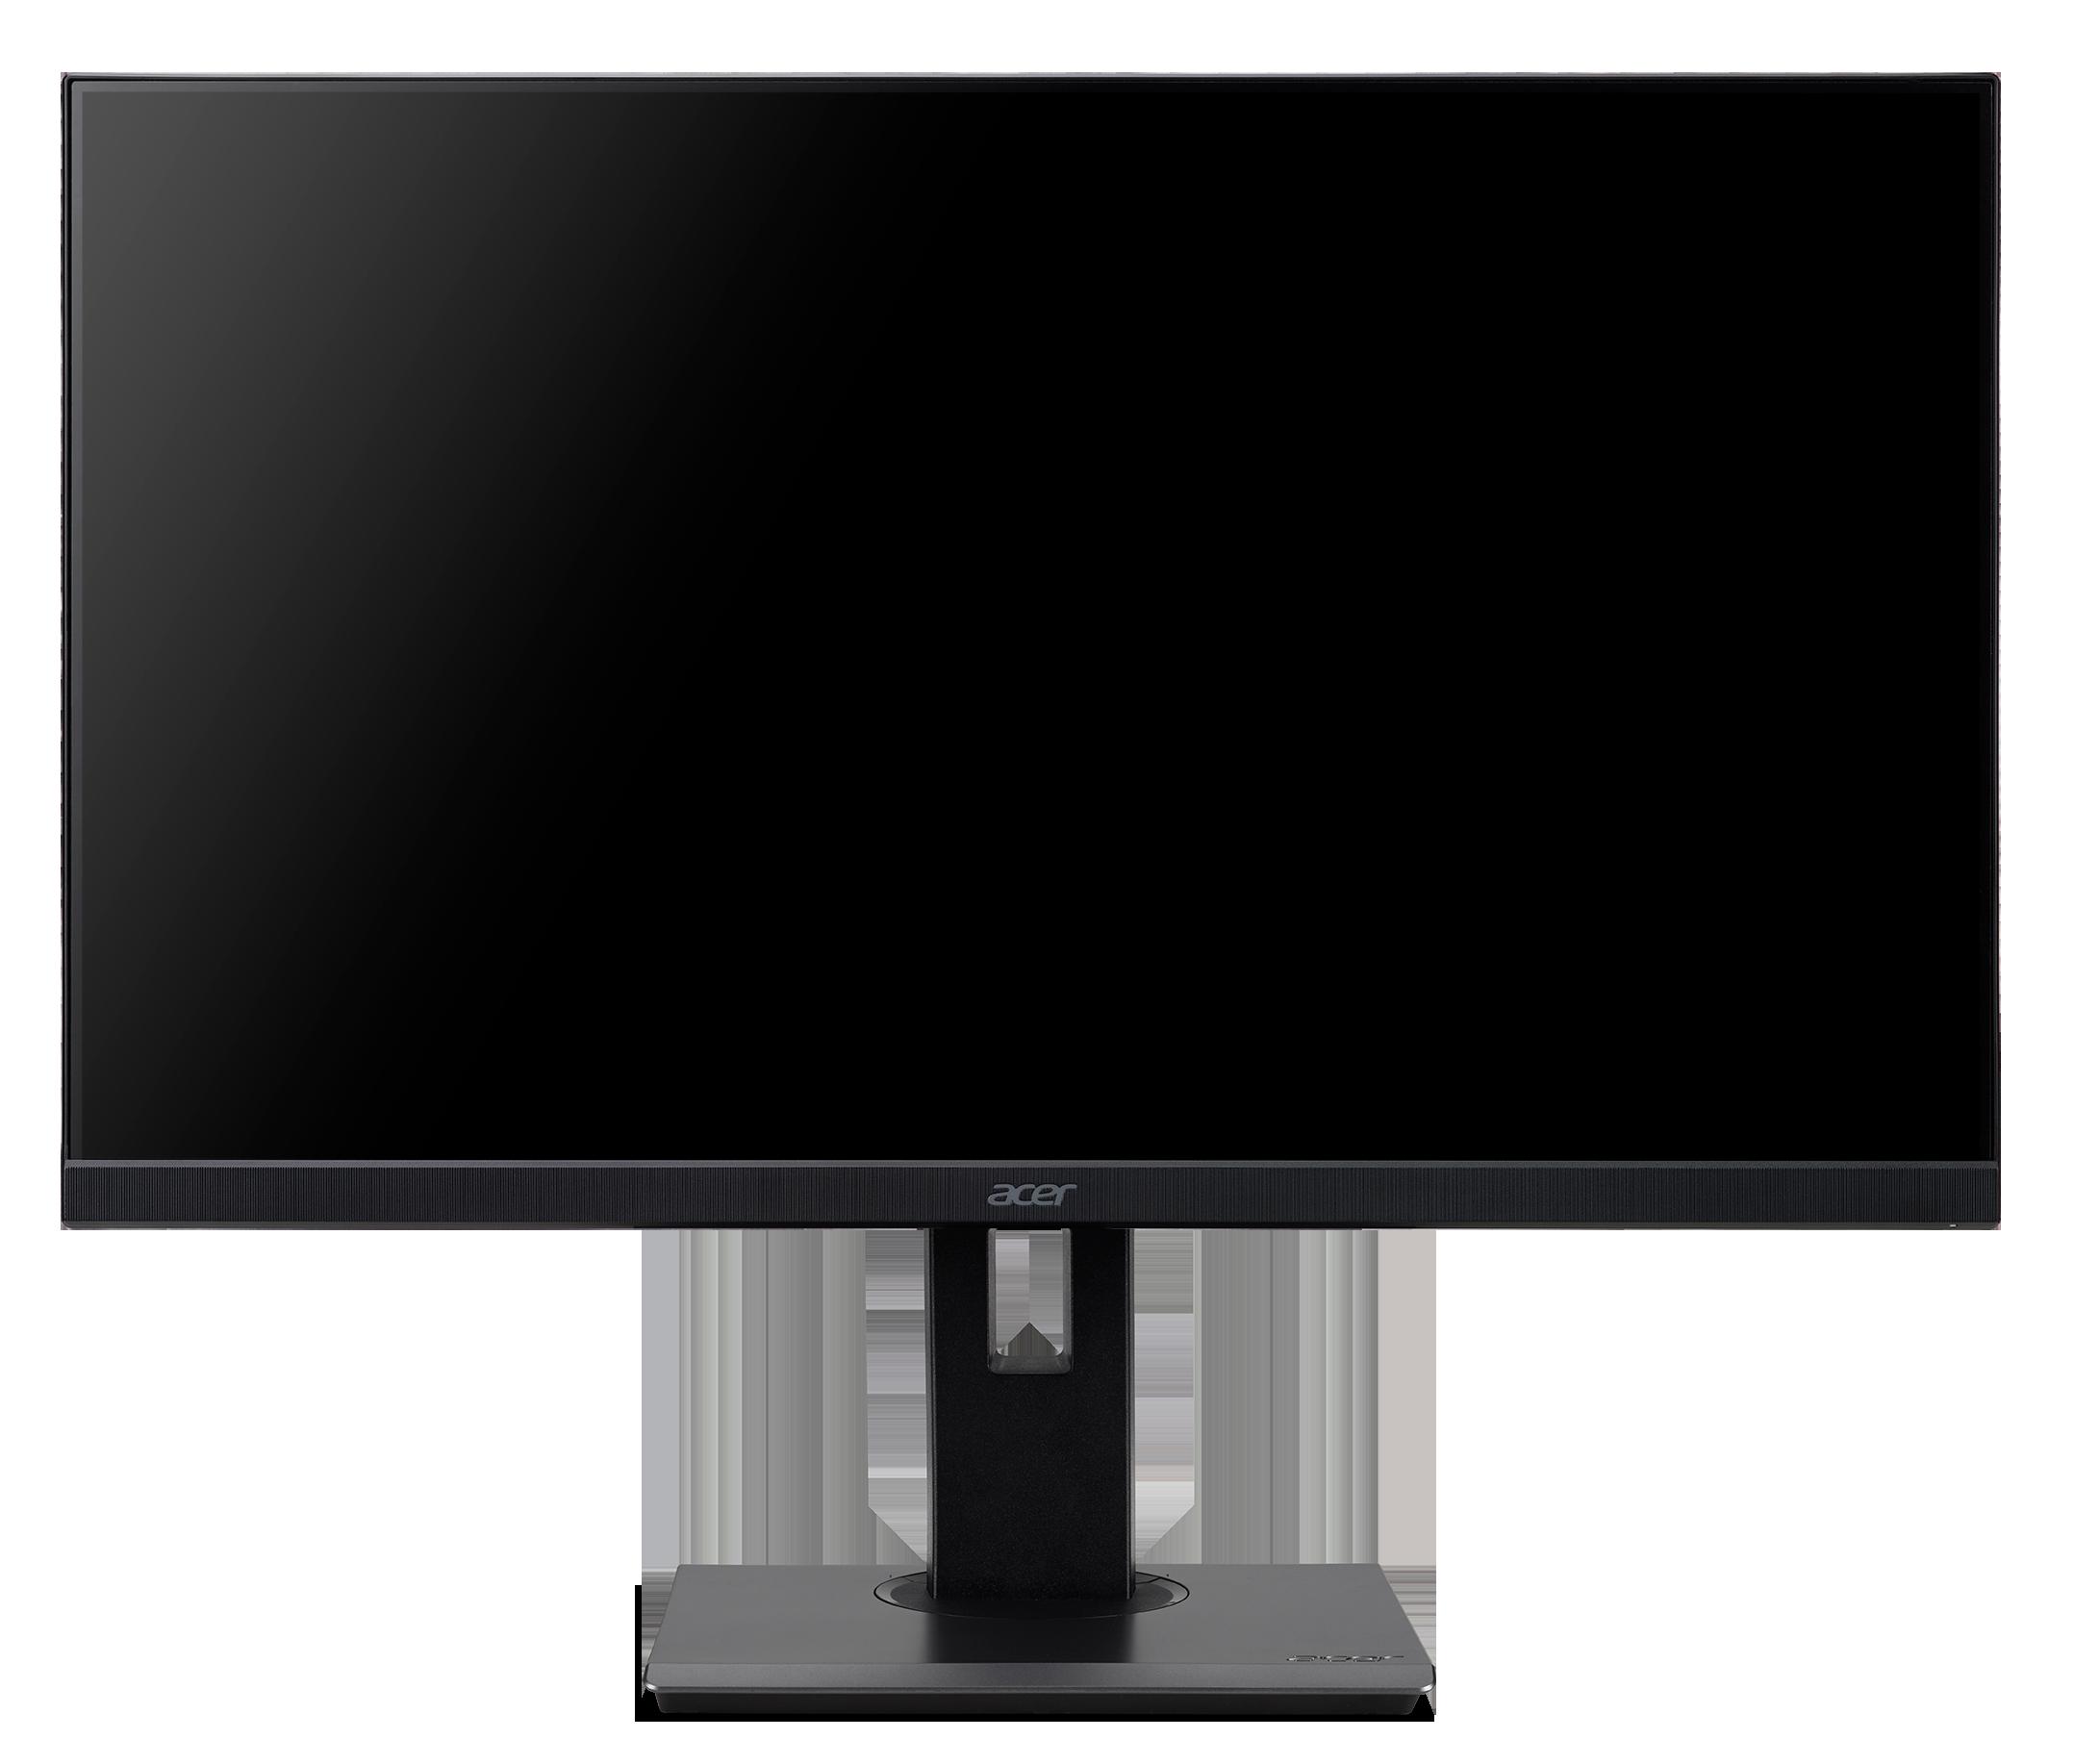 27'' LCD Acer B277 - IPS,FullHD,4ms,75Hz,250cd/m2, 100M:1,16:9,HDMI,DP,VGA,repro,pivot - UM.HB7EE.005